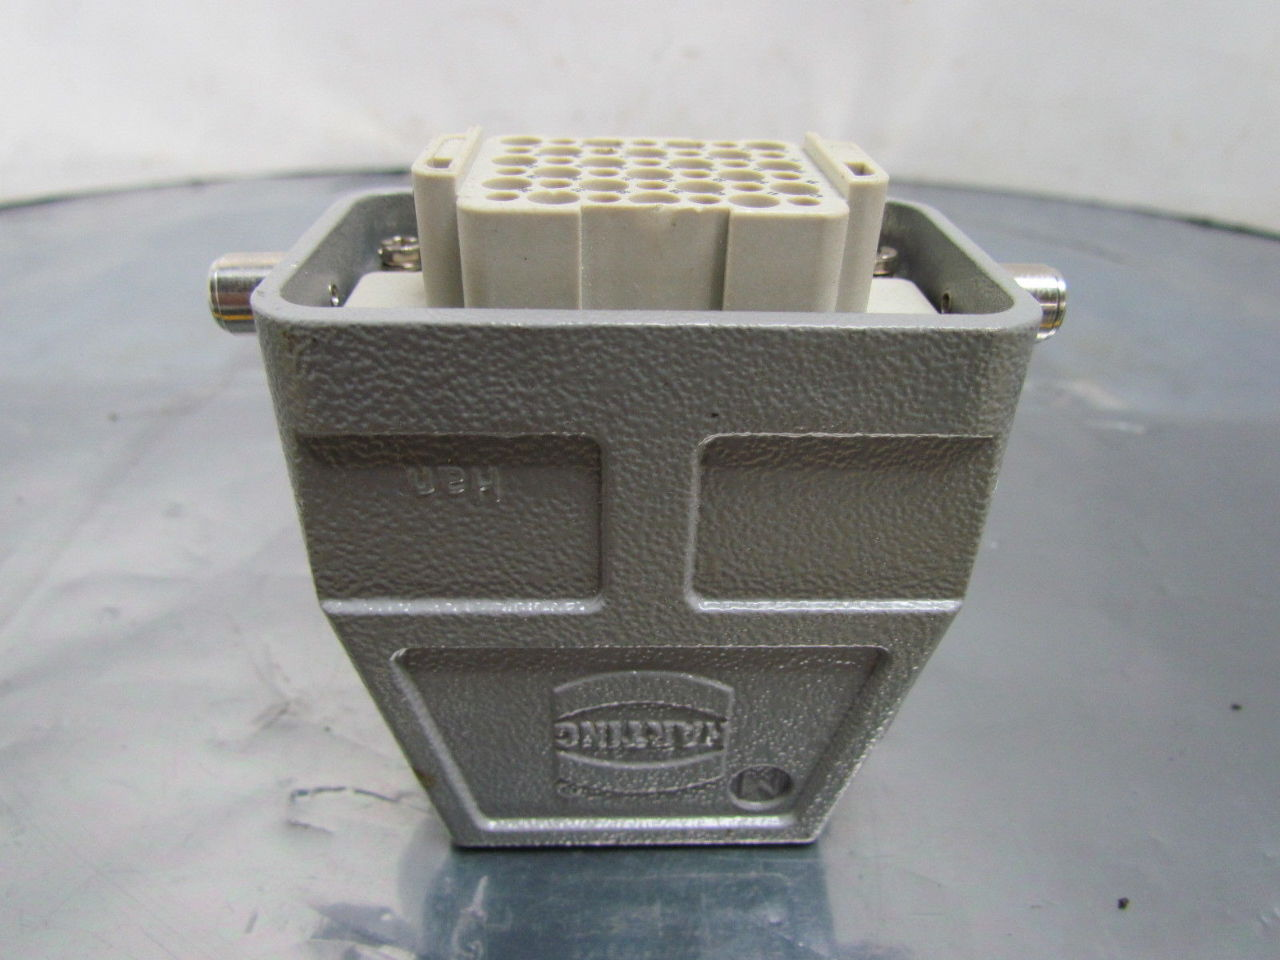 harting pc gf20 20 pin female connector plug aluminum hood home fuse box melting home fuse box labeling #9